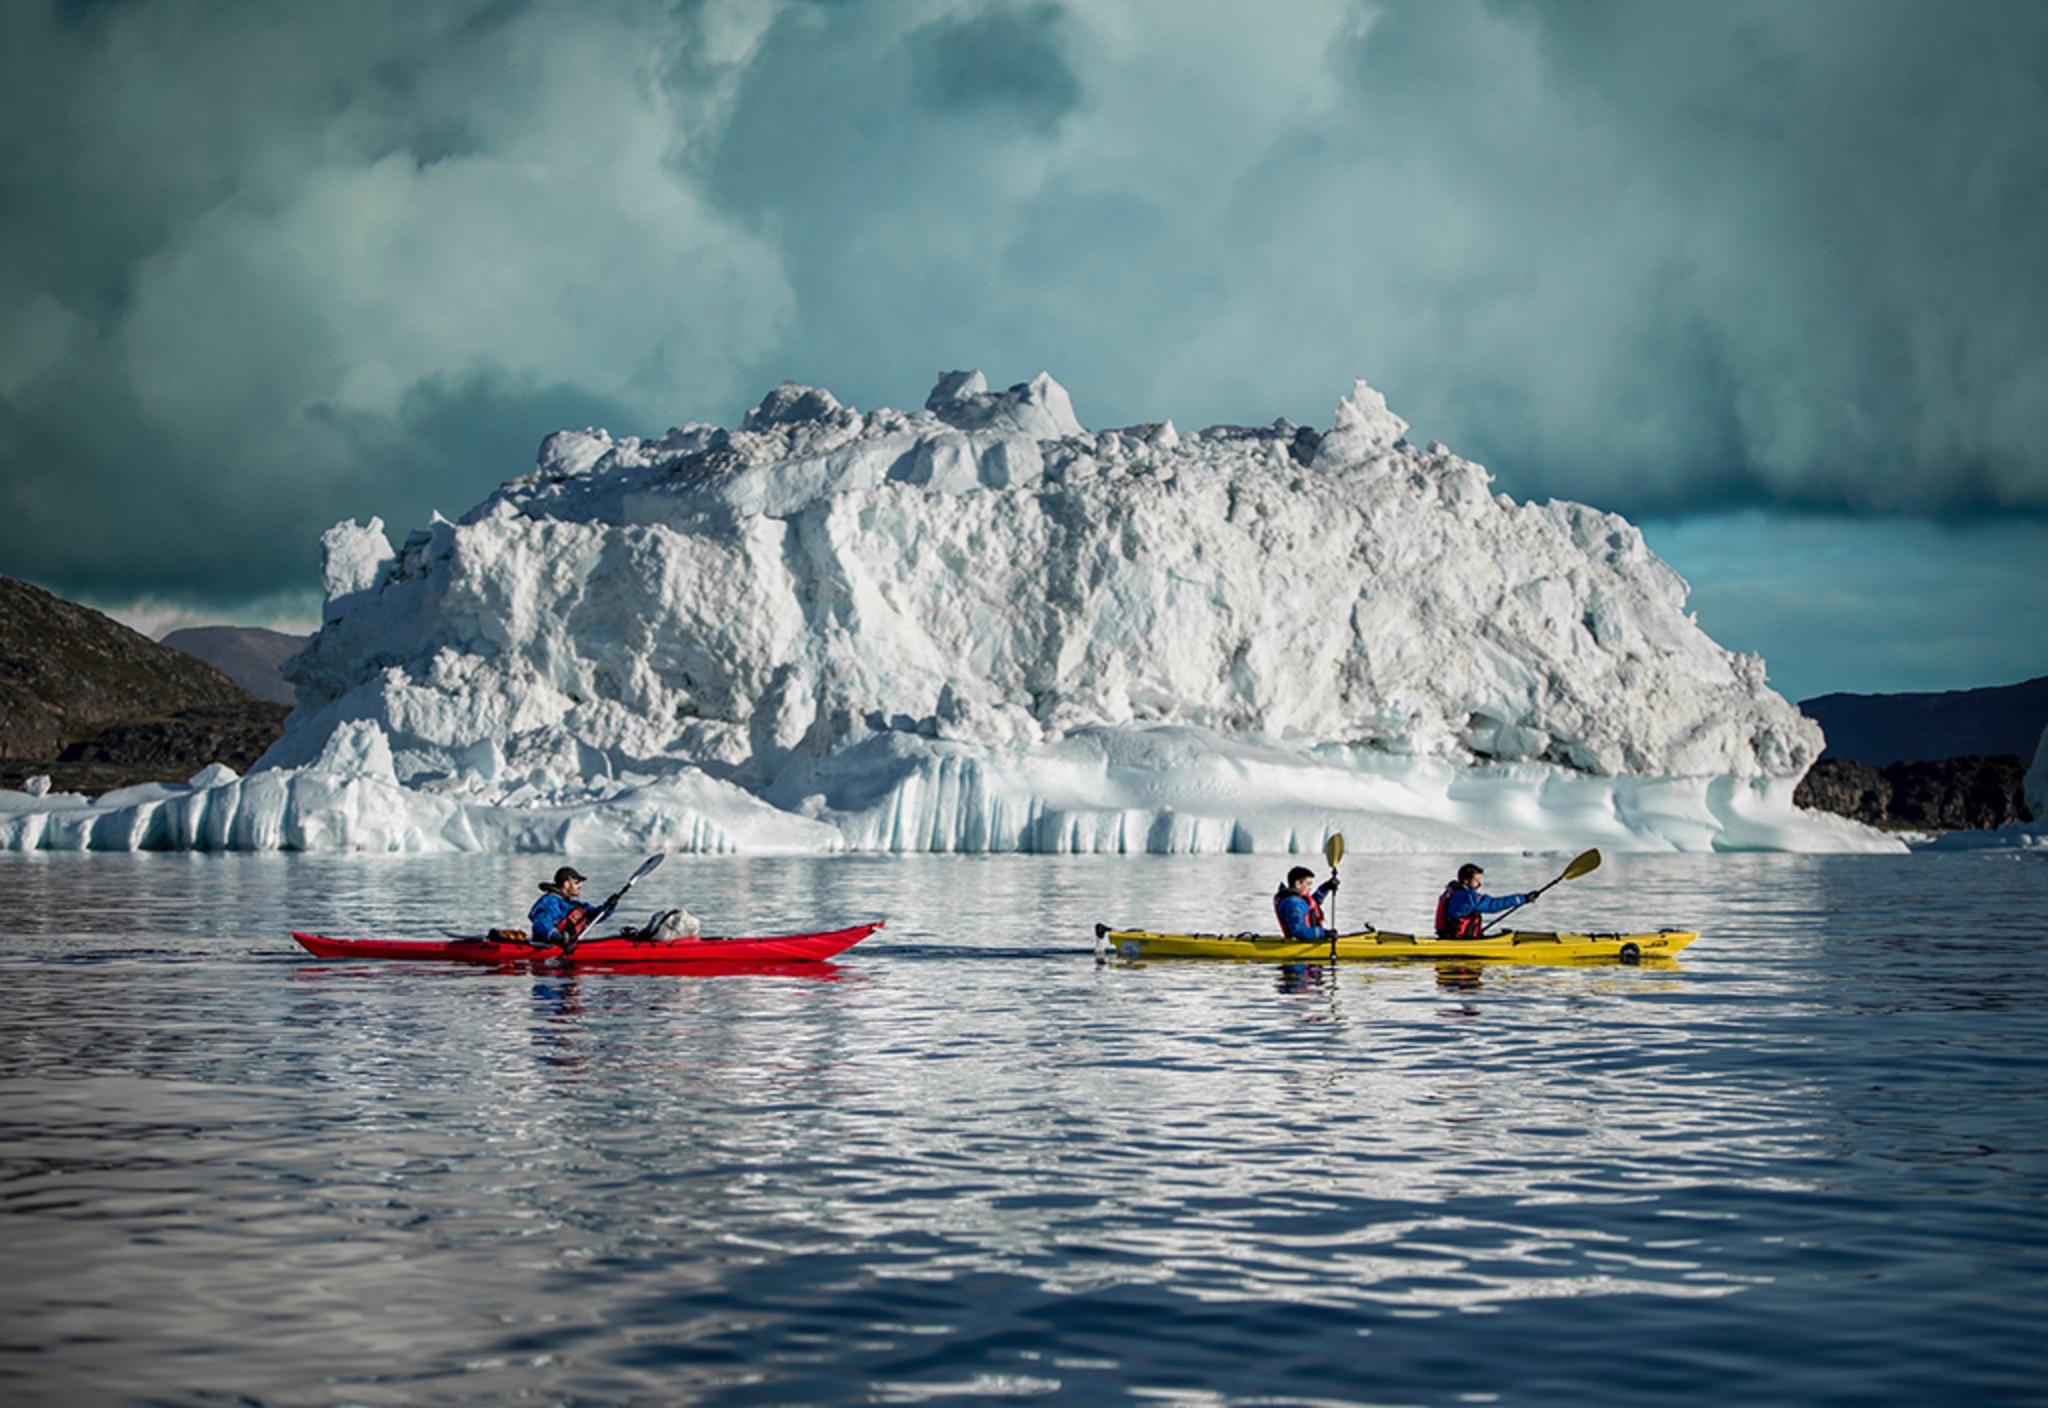 Kayaking amongst icebergs, Greenland | photo Mads Pihl